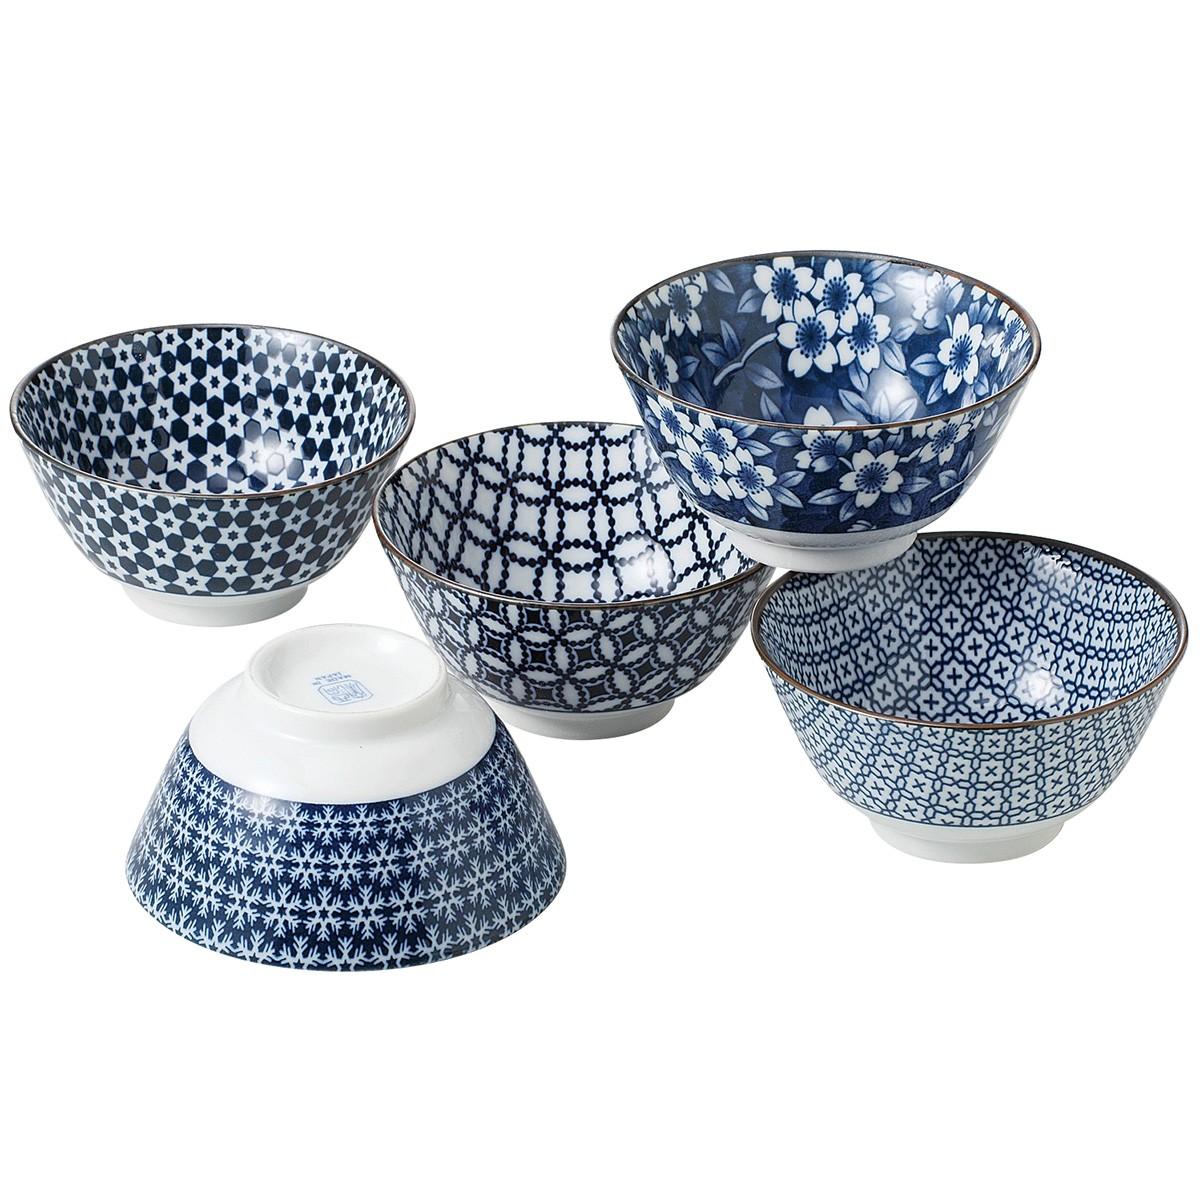 Nami 5 Piece Porcelain Multi Bowl Set